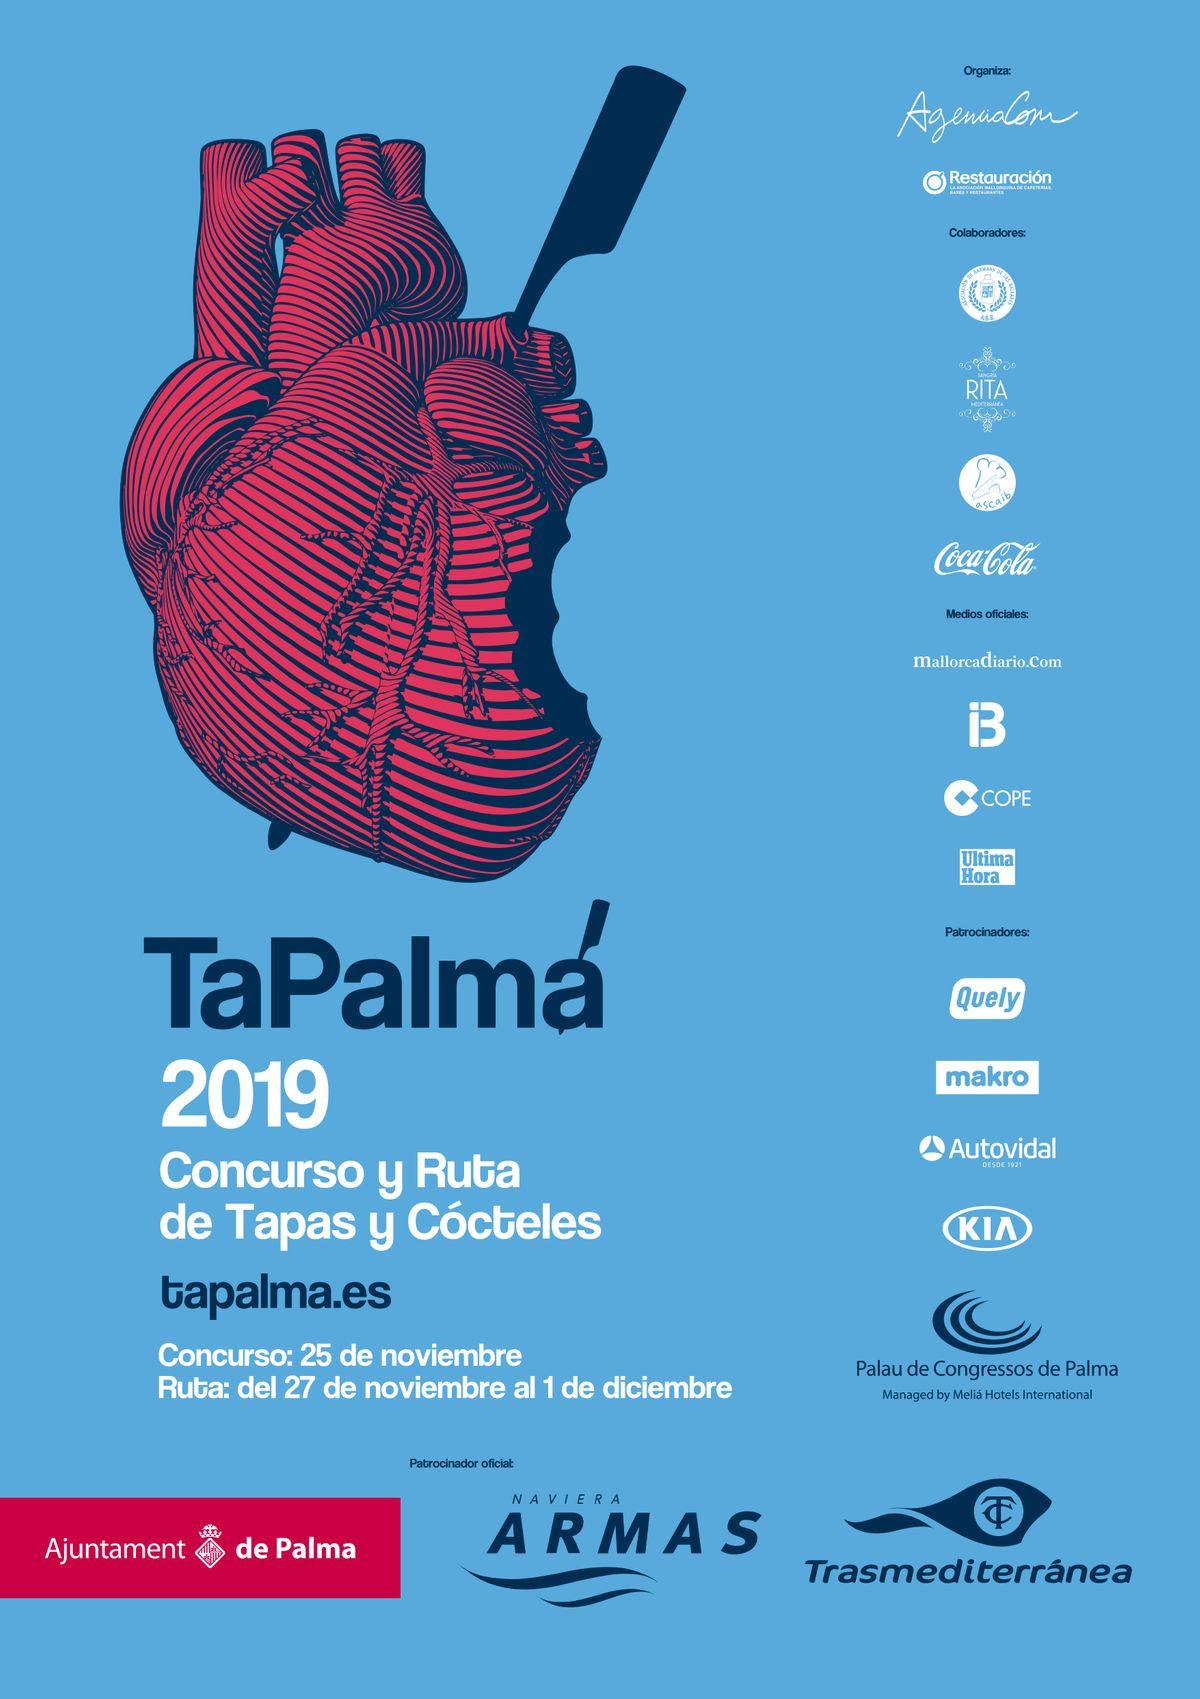 TaPalma 2019